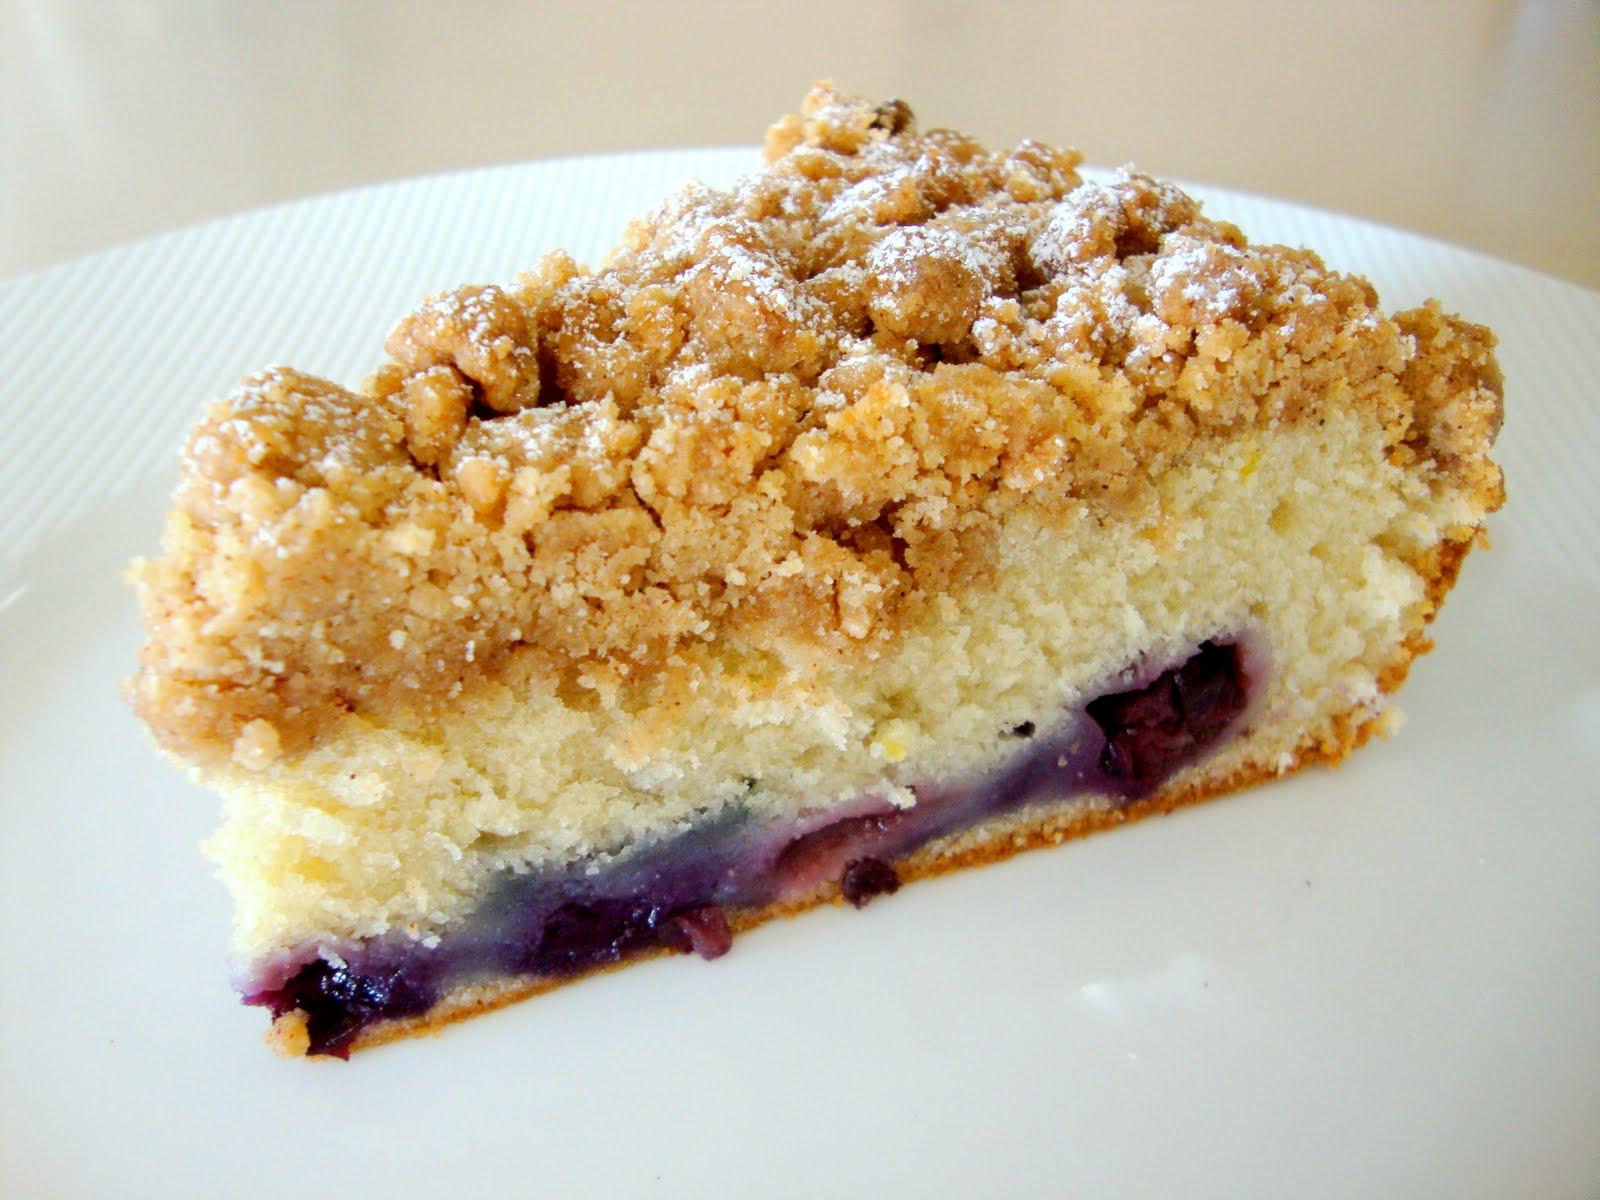 Blueberry Crumb Cake  AJ s Cooking Secrets Blueberry Crumb Cake